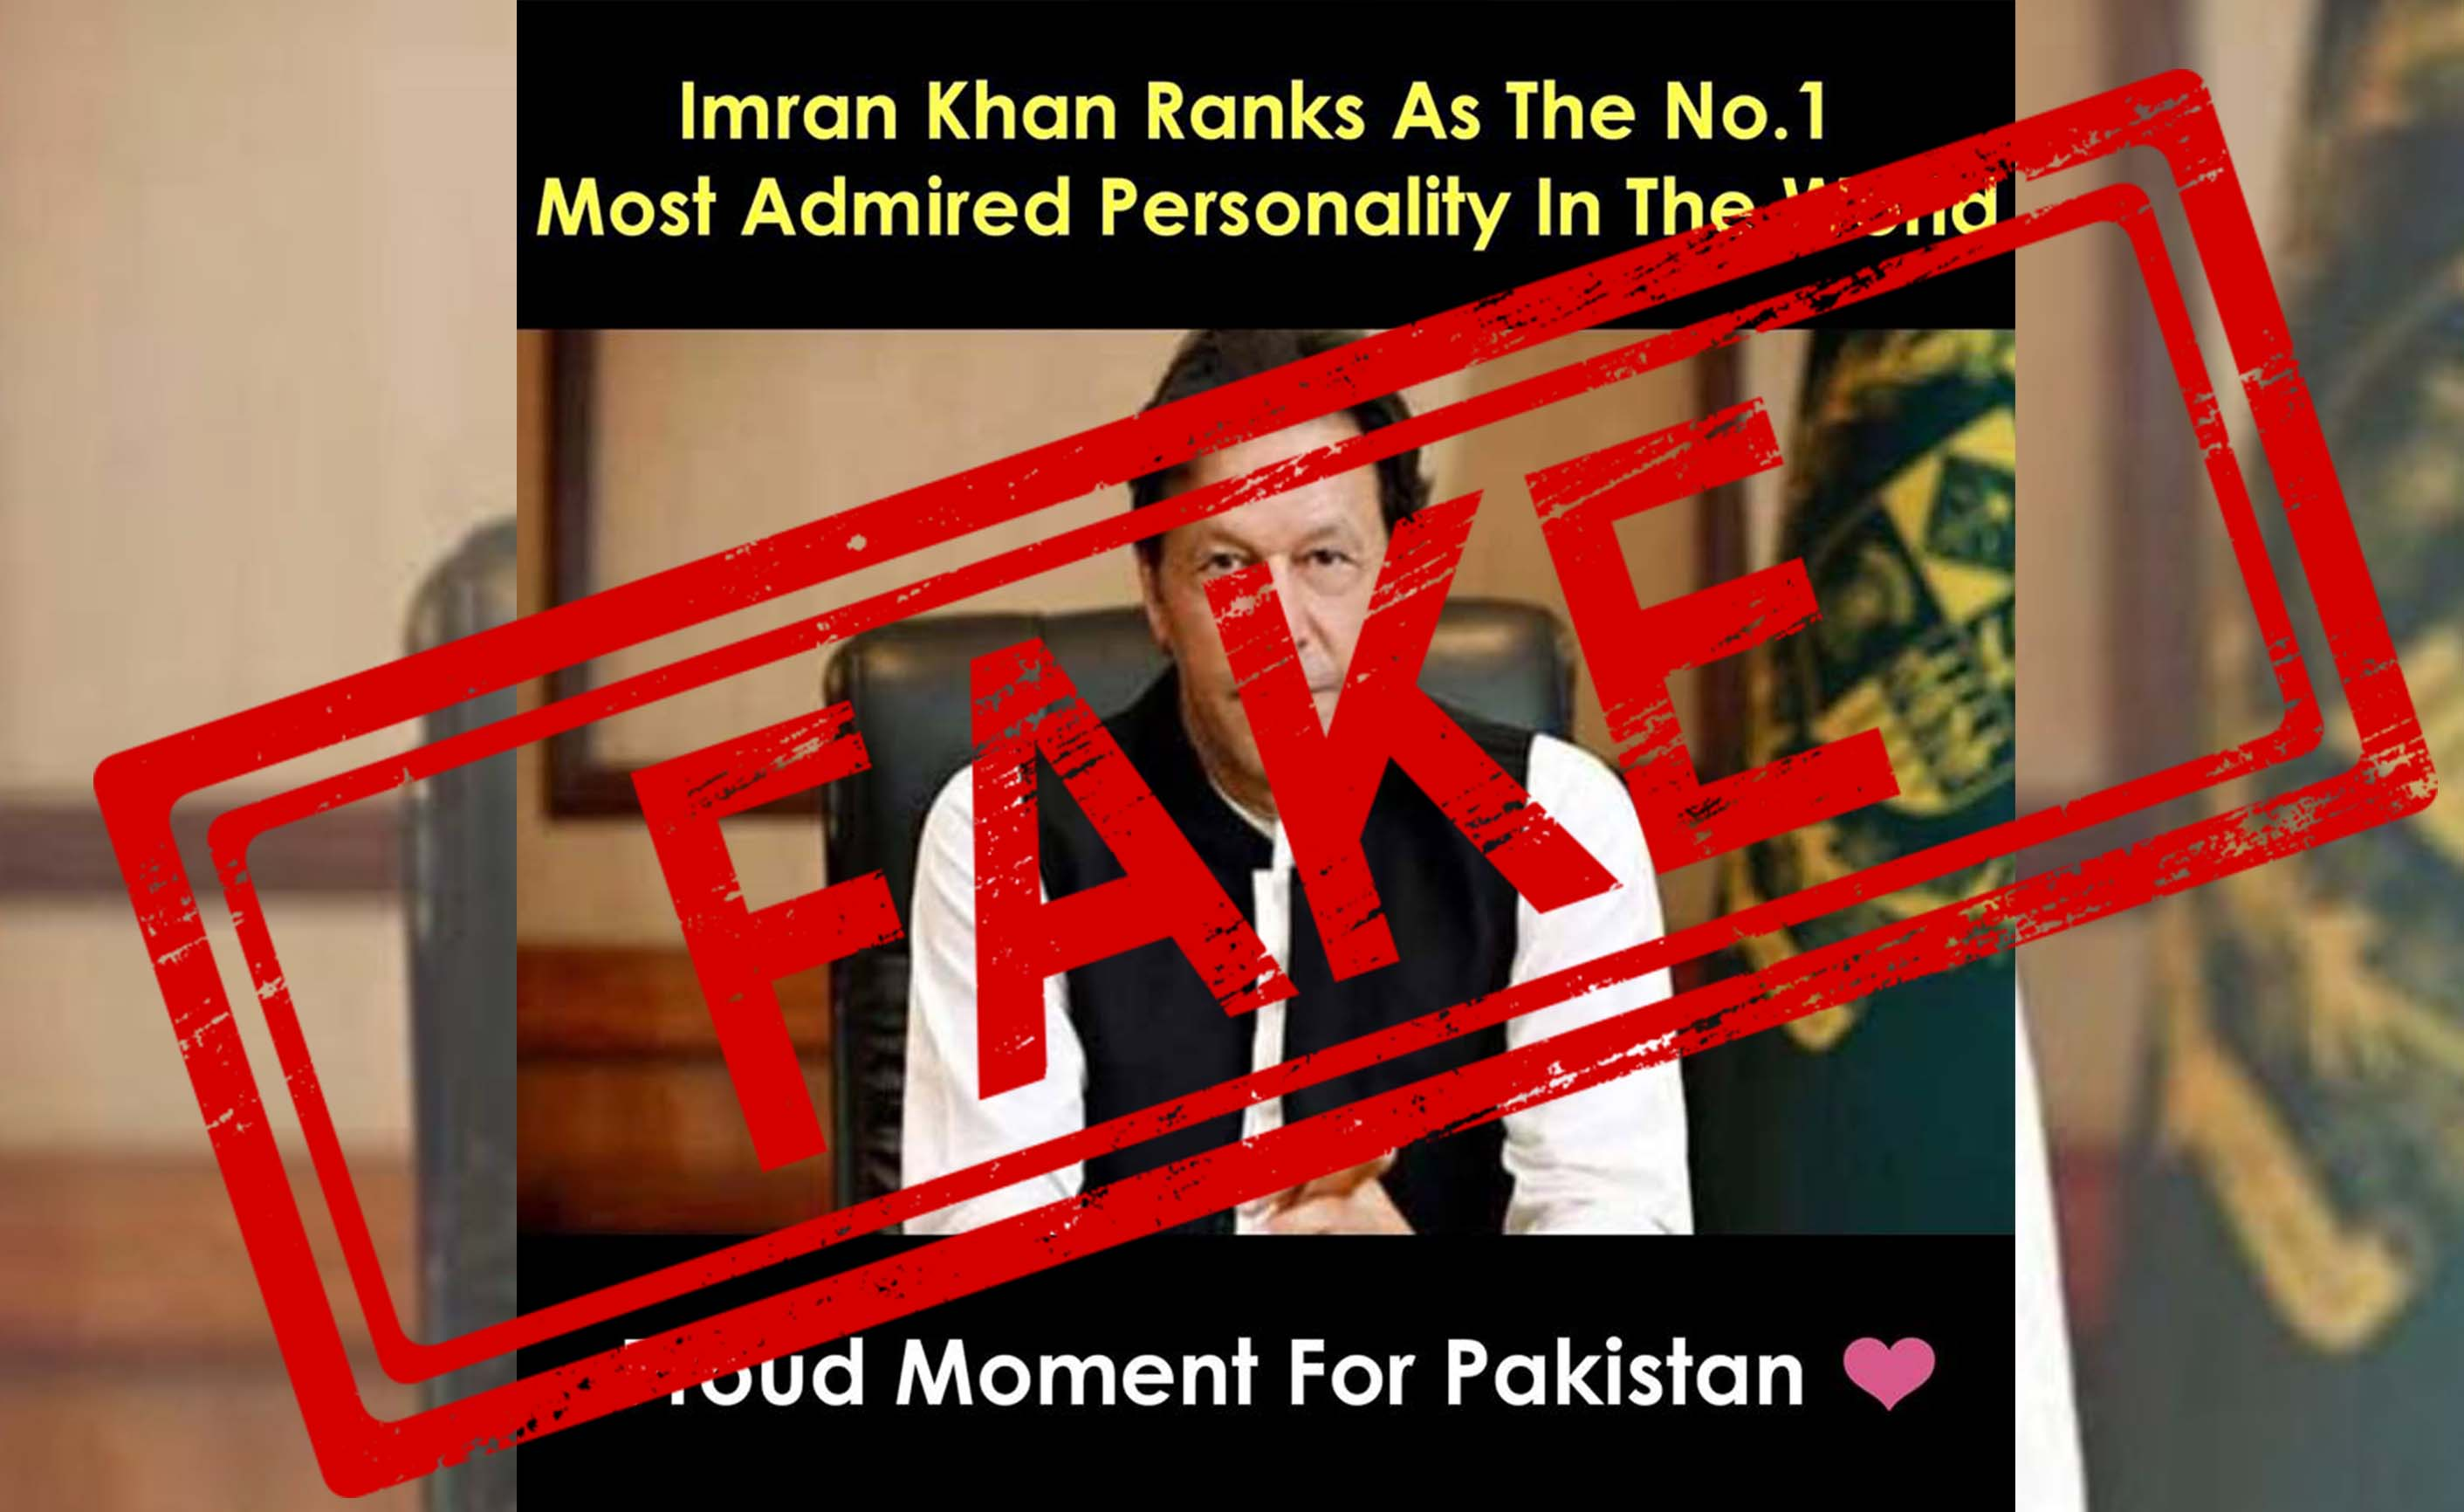 Imran Khan, Pakistan, Prime Minister, Rank, Number 1, most, Admired, List, Narendra Modi, NewsMobile, Mobile, news, India, Fact Check, FactChecker, Fake